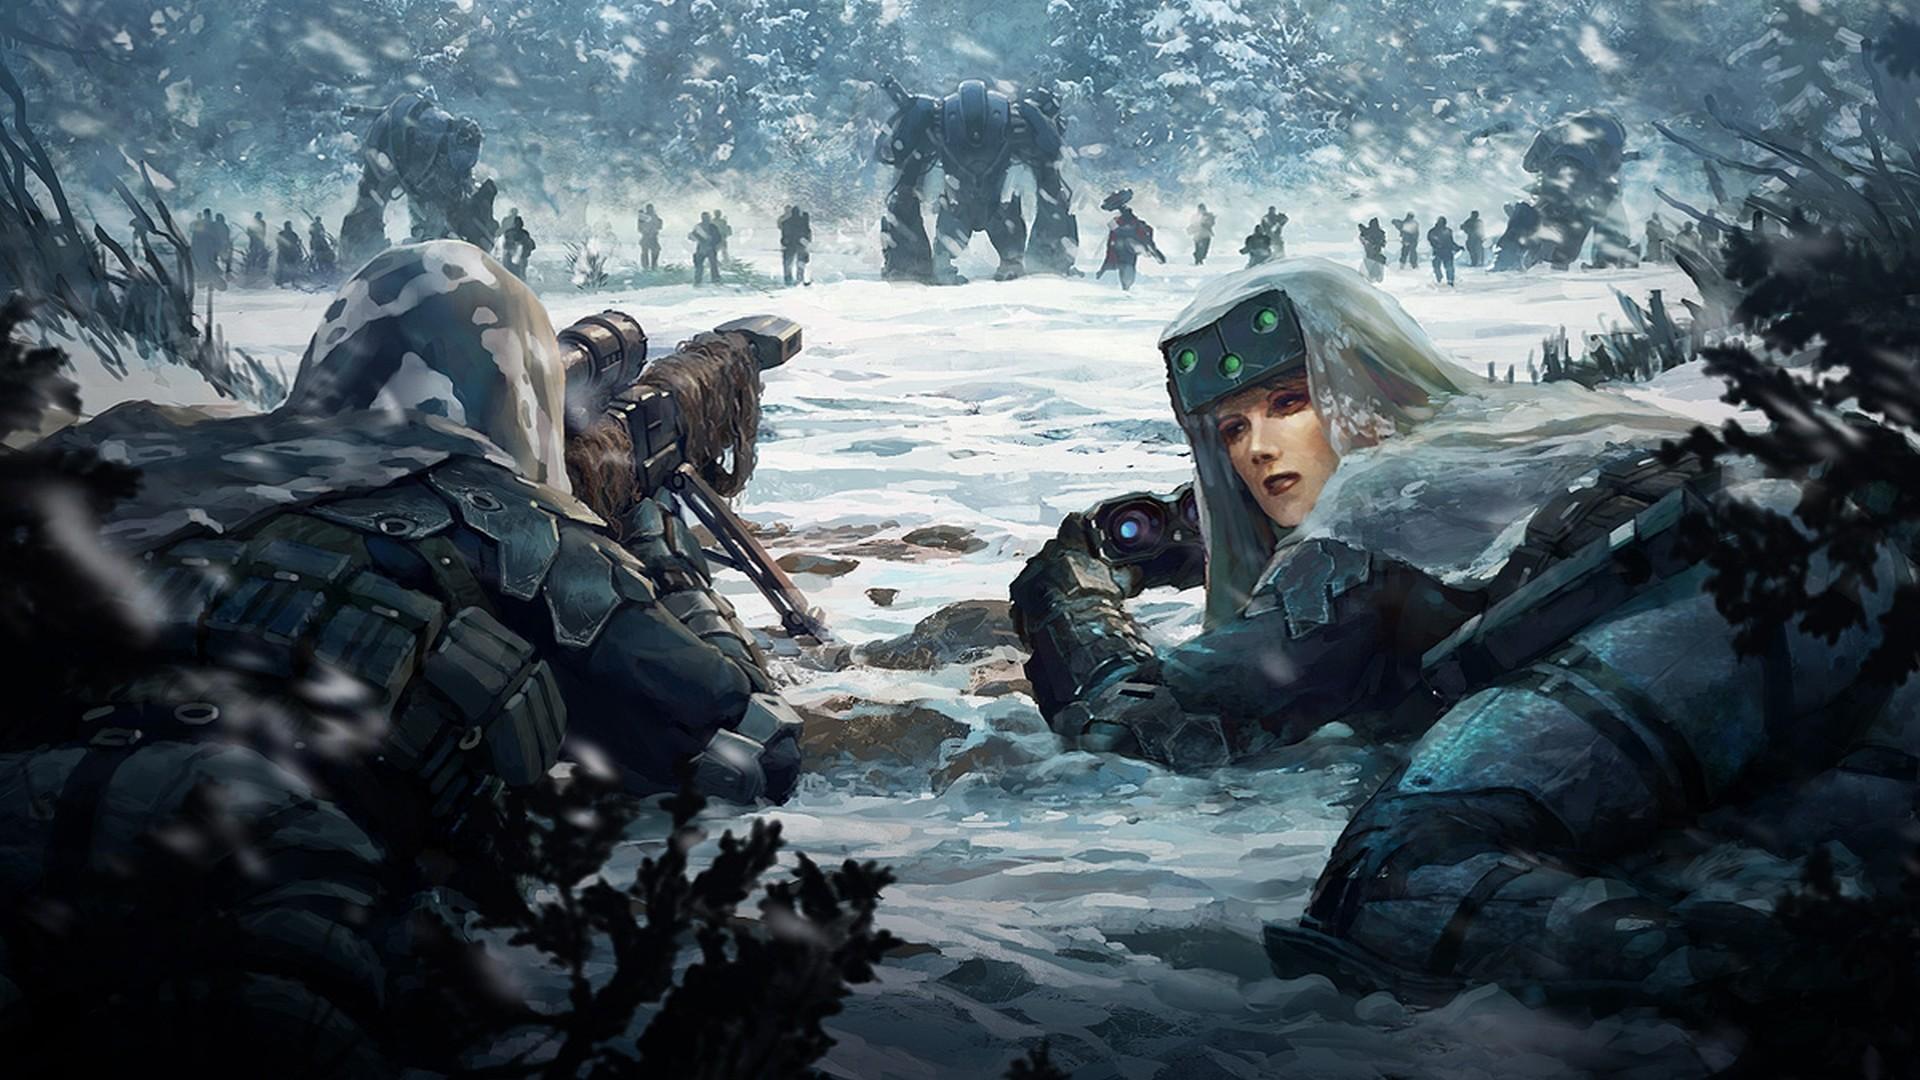 Science Fiction Battle wallpaper – 1246125